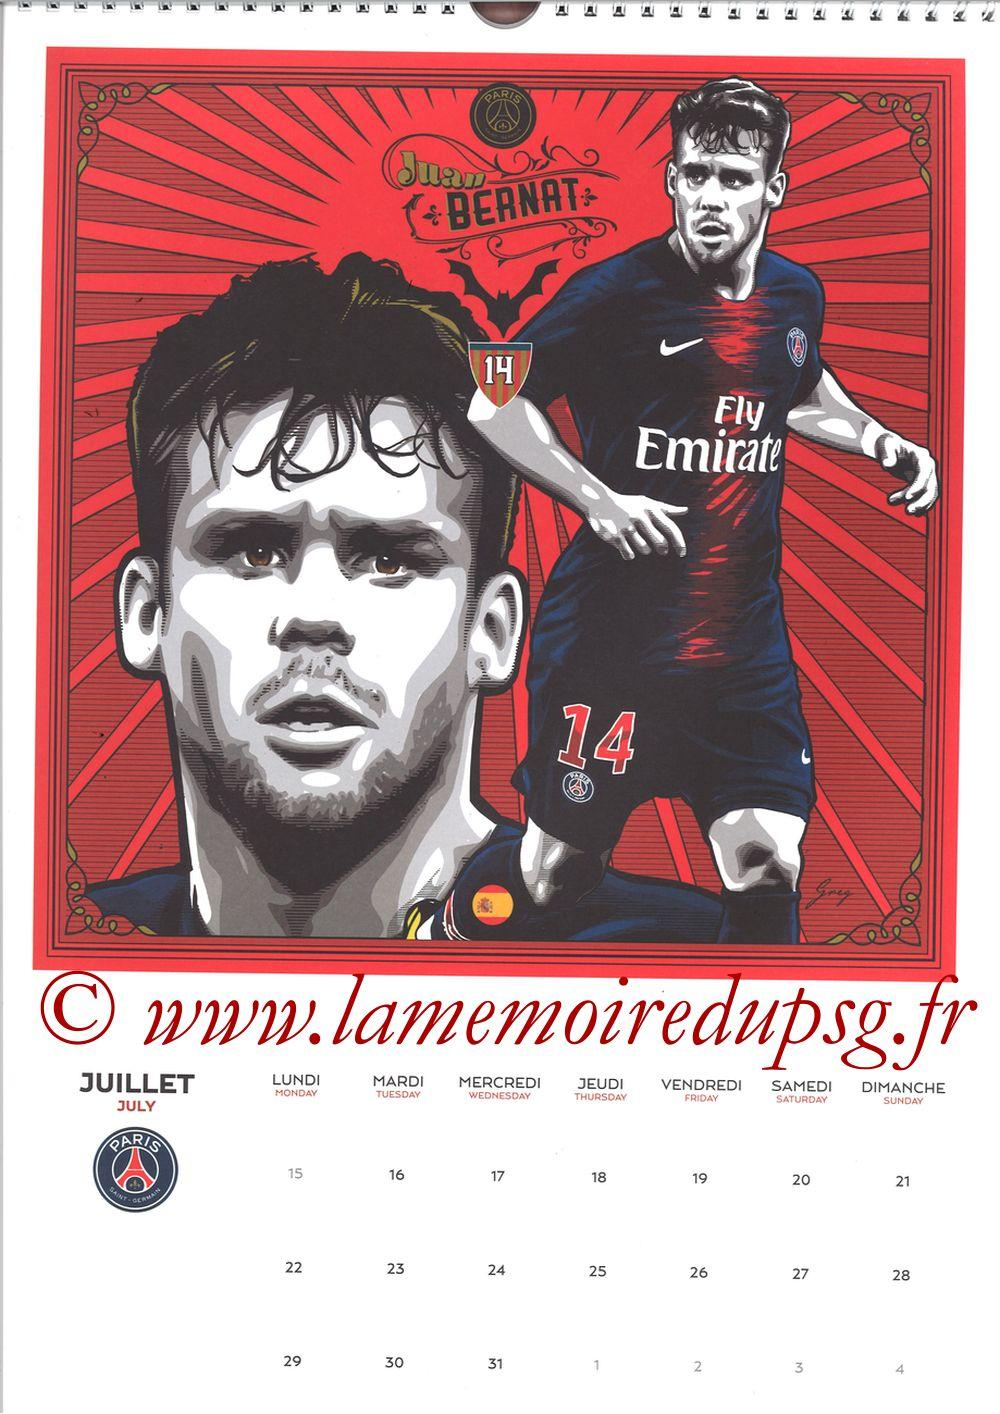 Calendrier PSG 2019 - Page 14 - Juan BERNAT